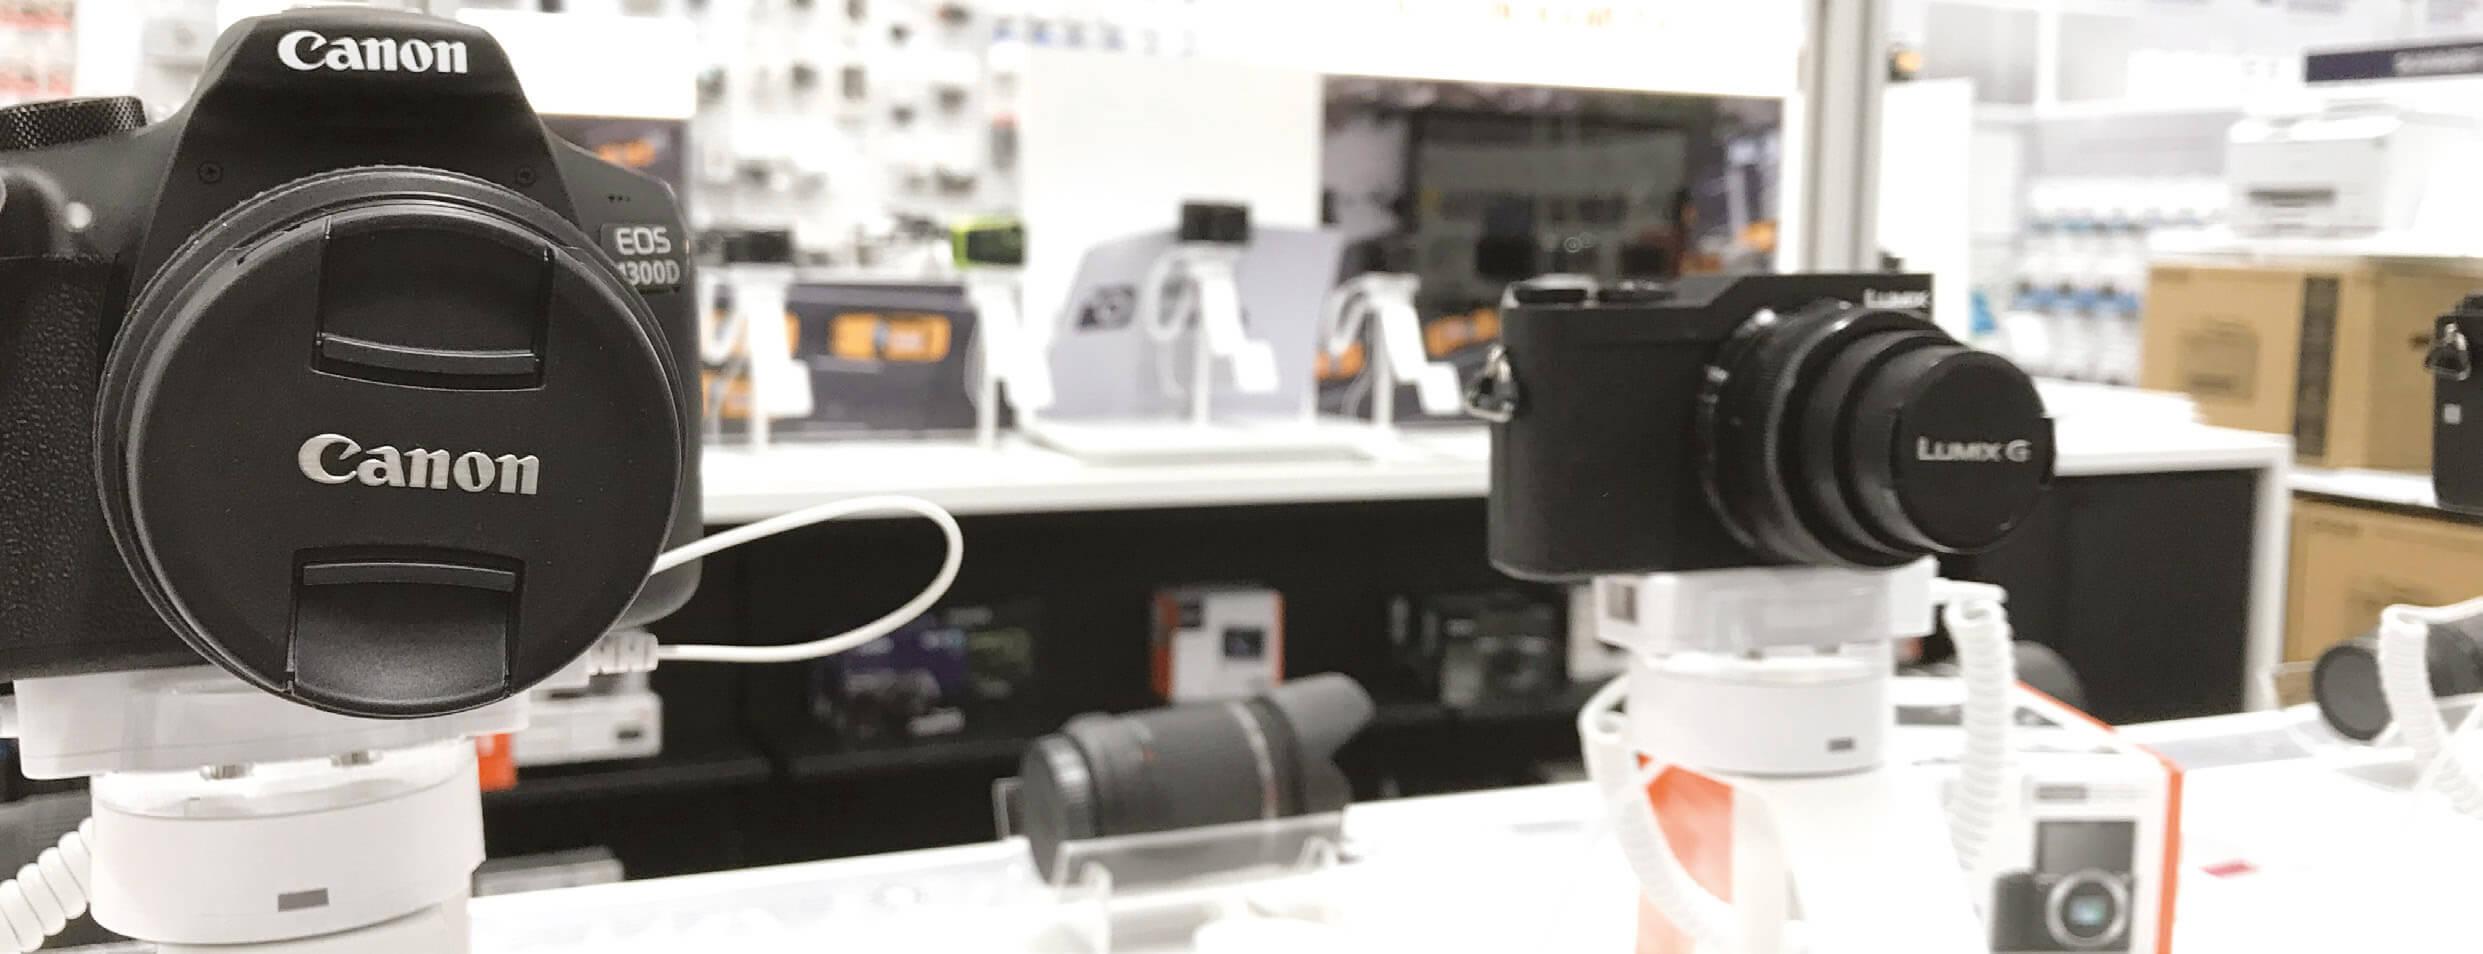 Sens Retail camera security